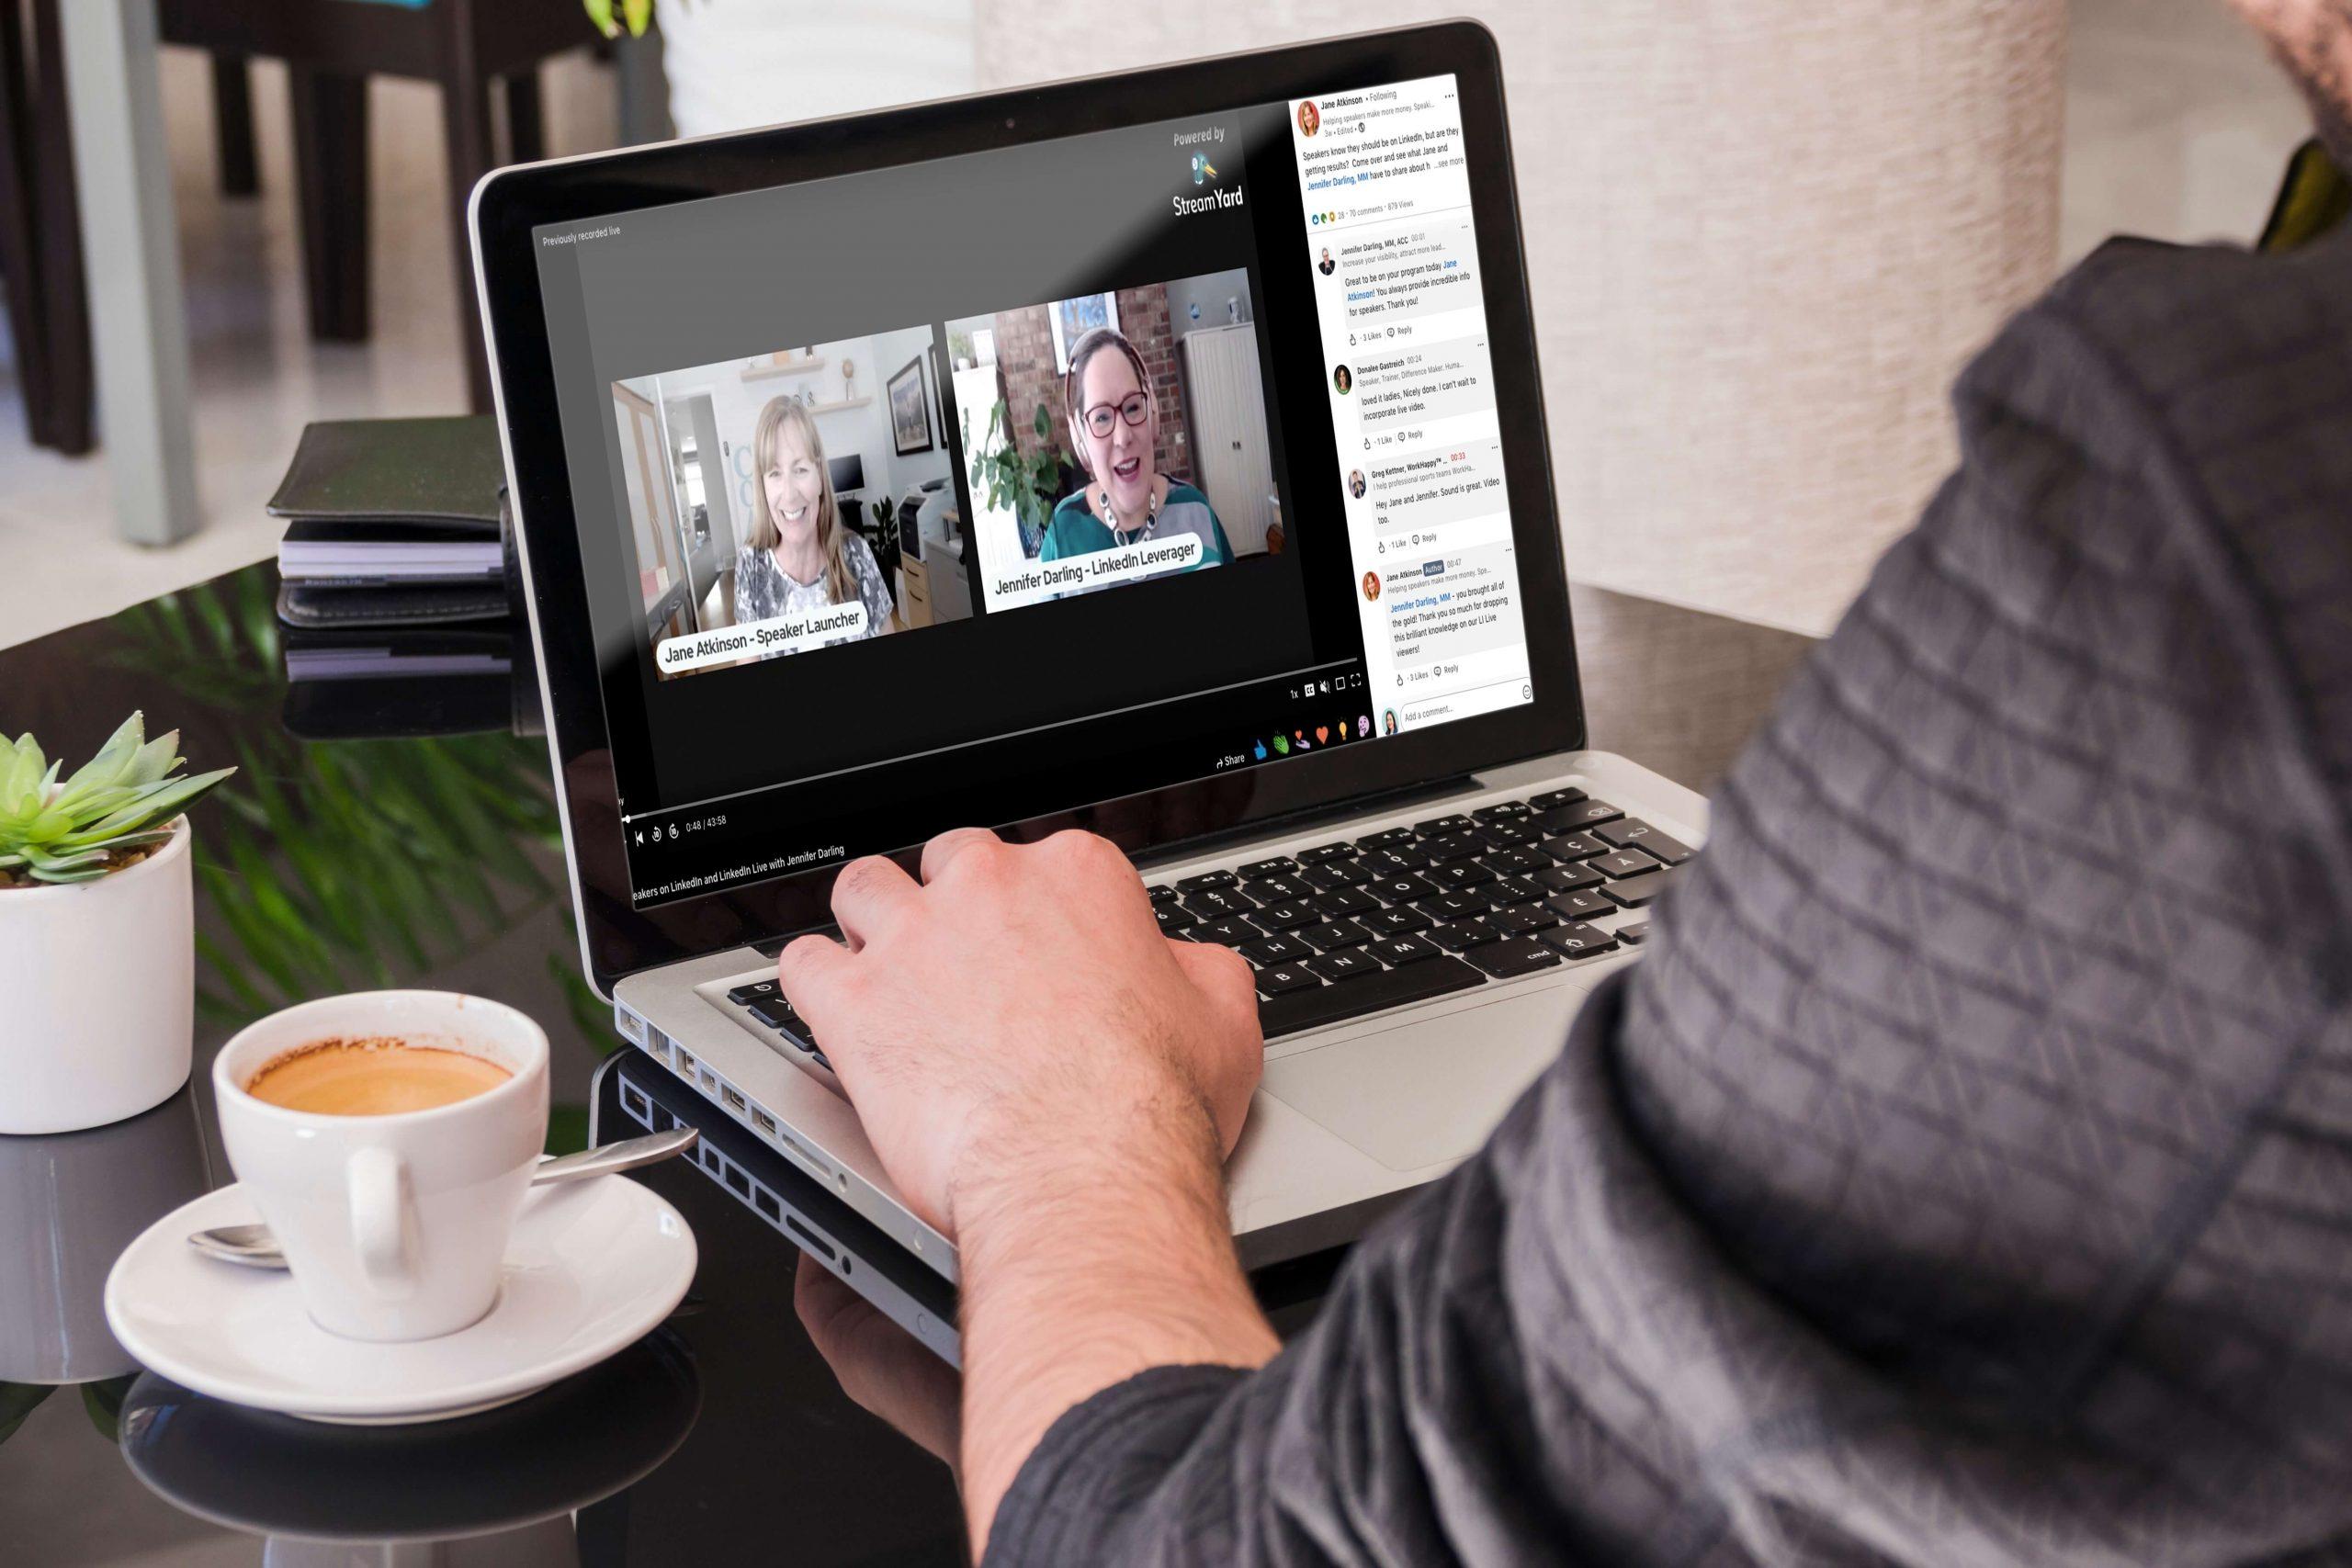 Every Public Speaker Should Be Using LinkedIn Live image